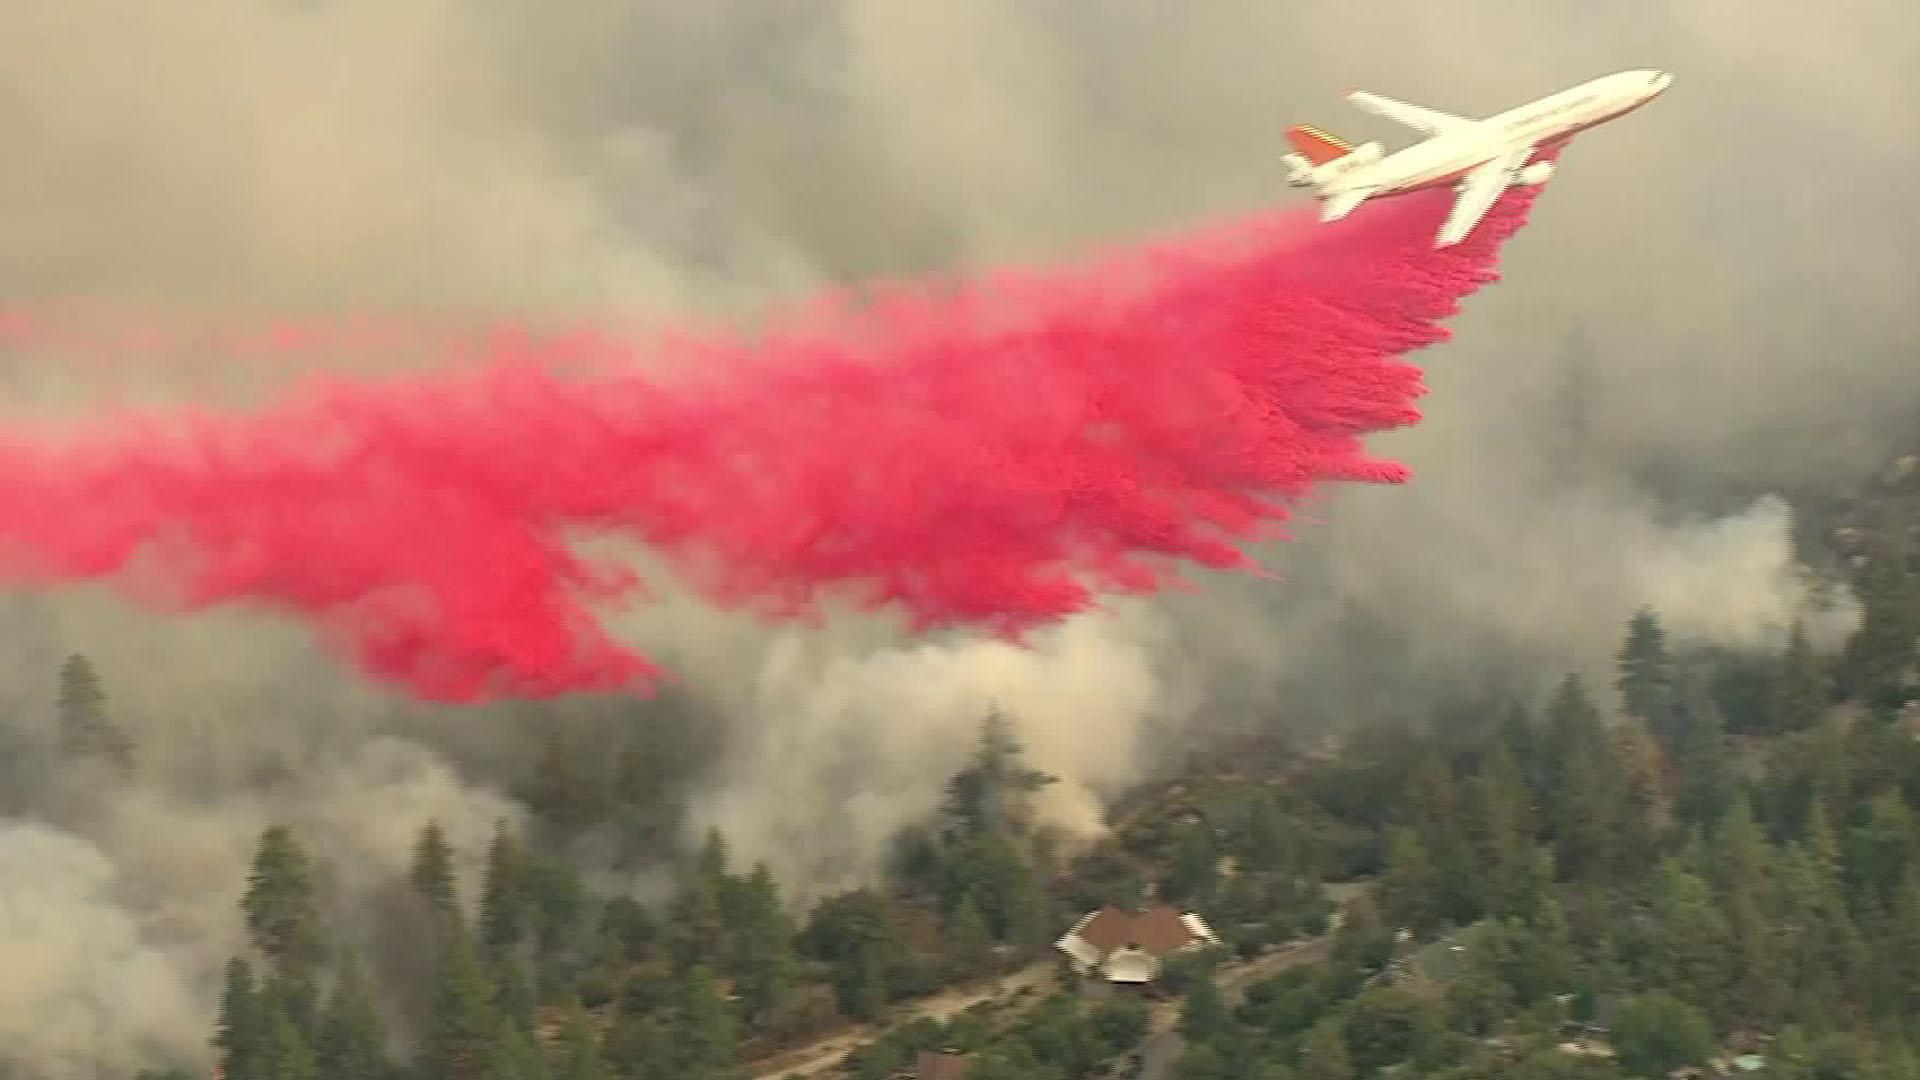 An aircraft makes a fire retardant drop as the Cranston Fire burns in Idyllwild on July 25, 2018. (Credit: KTLA)